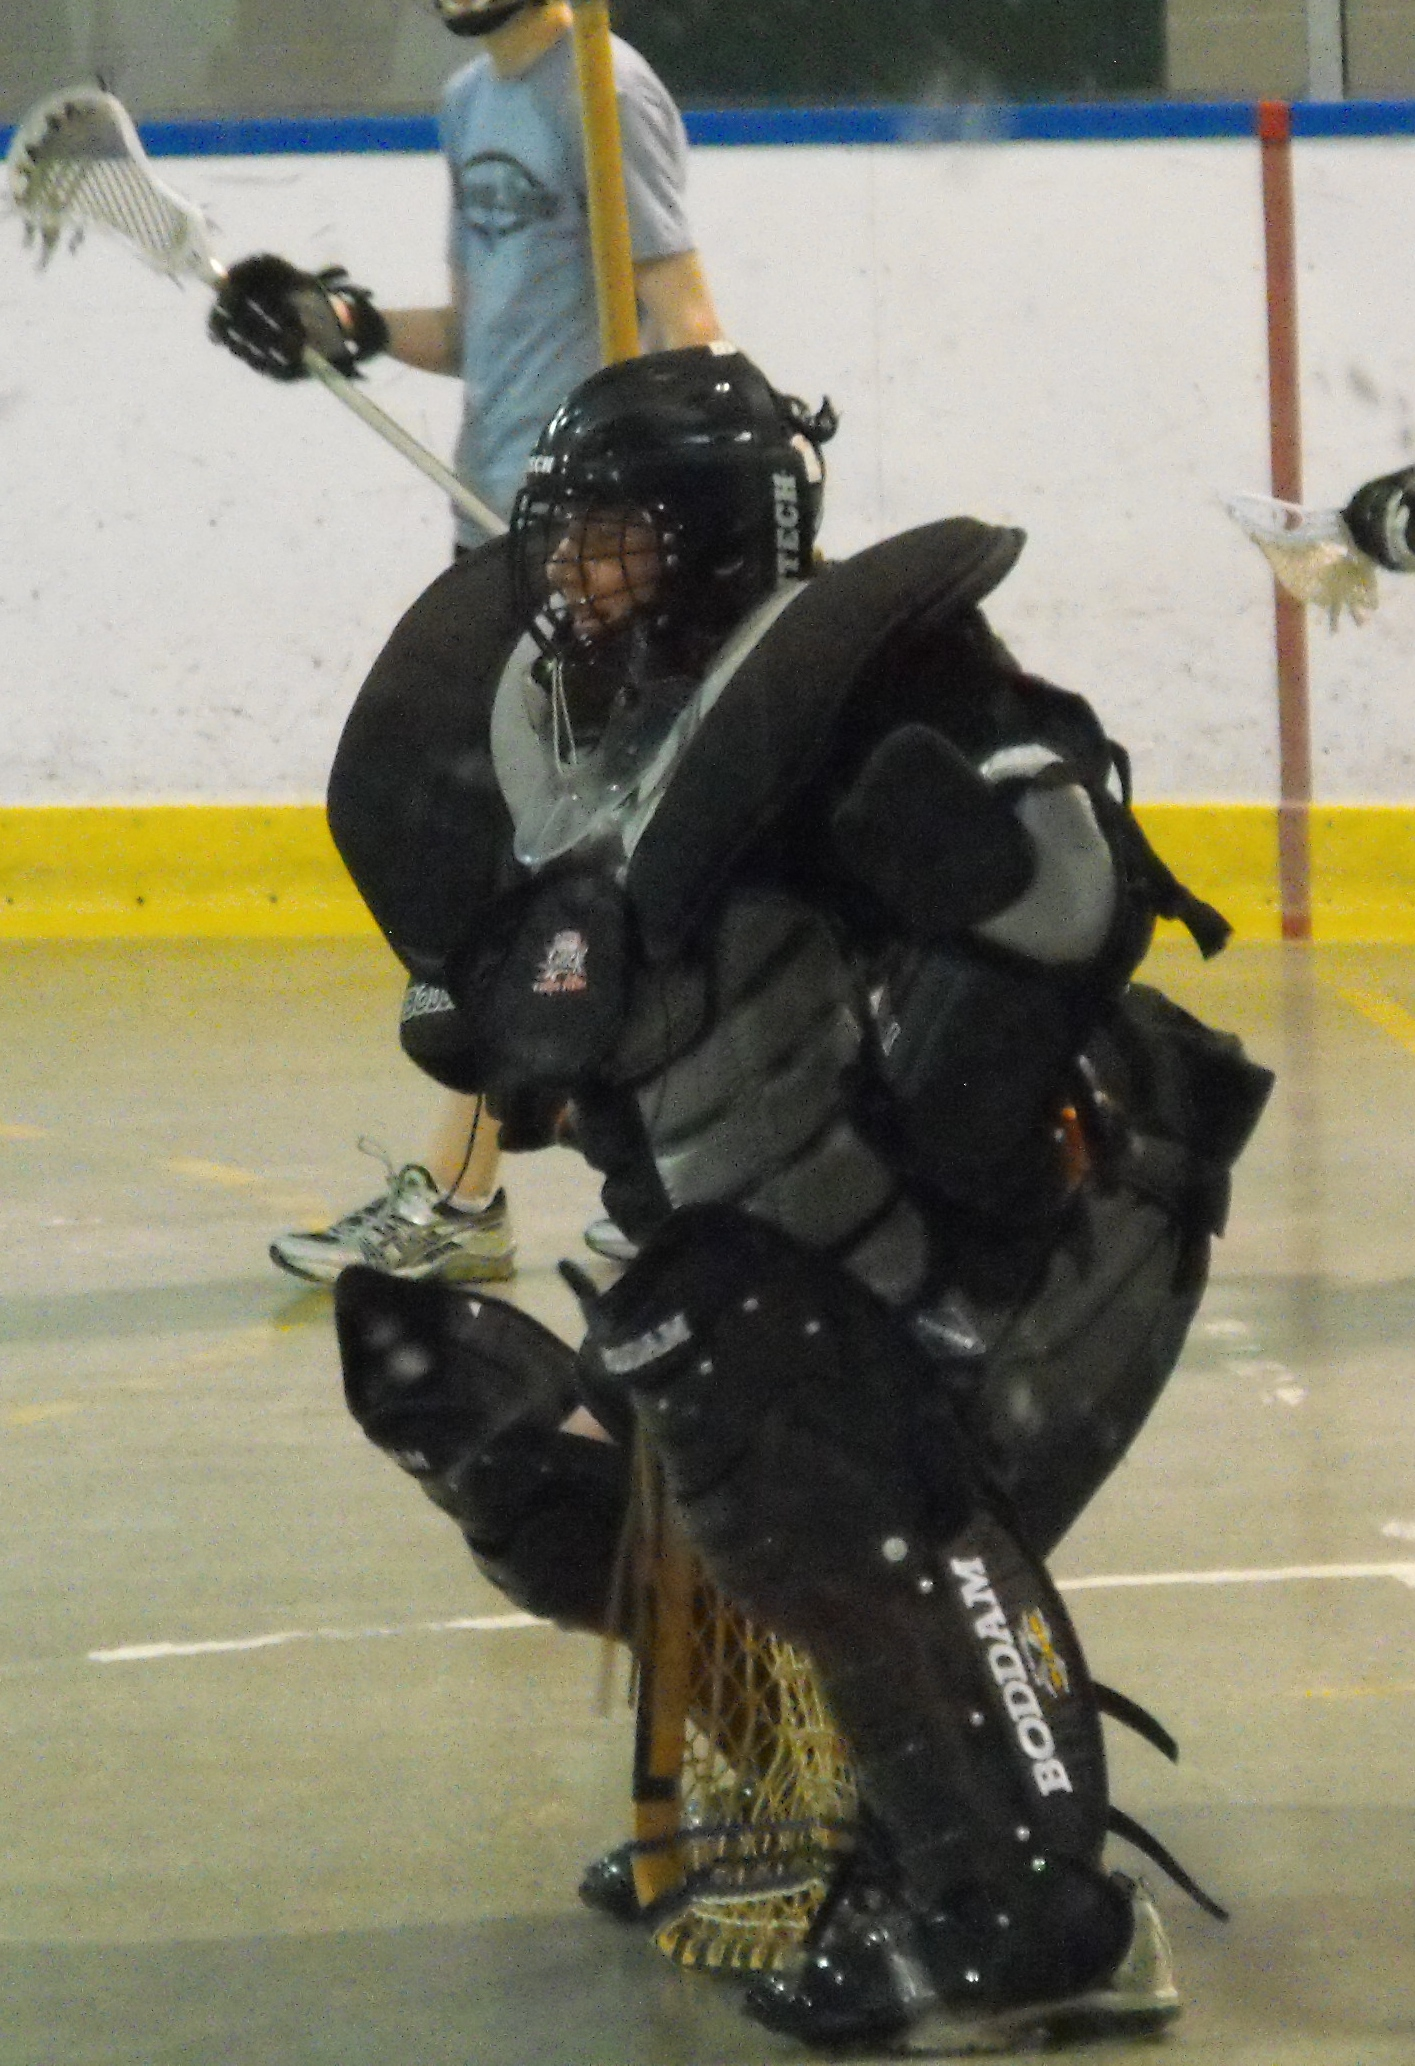 Lacrosse style pads for hockey - Goalie Store Bulletin Board